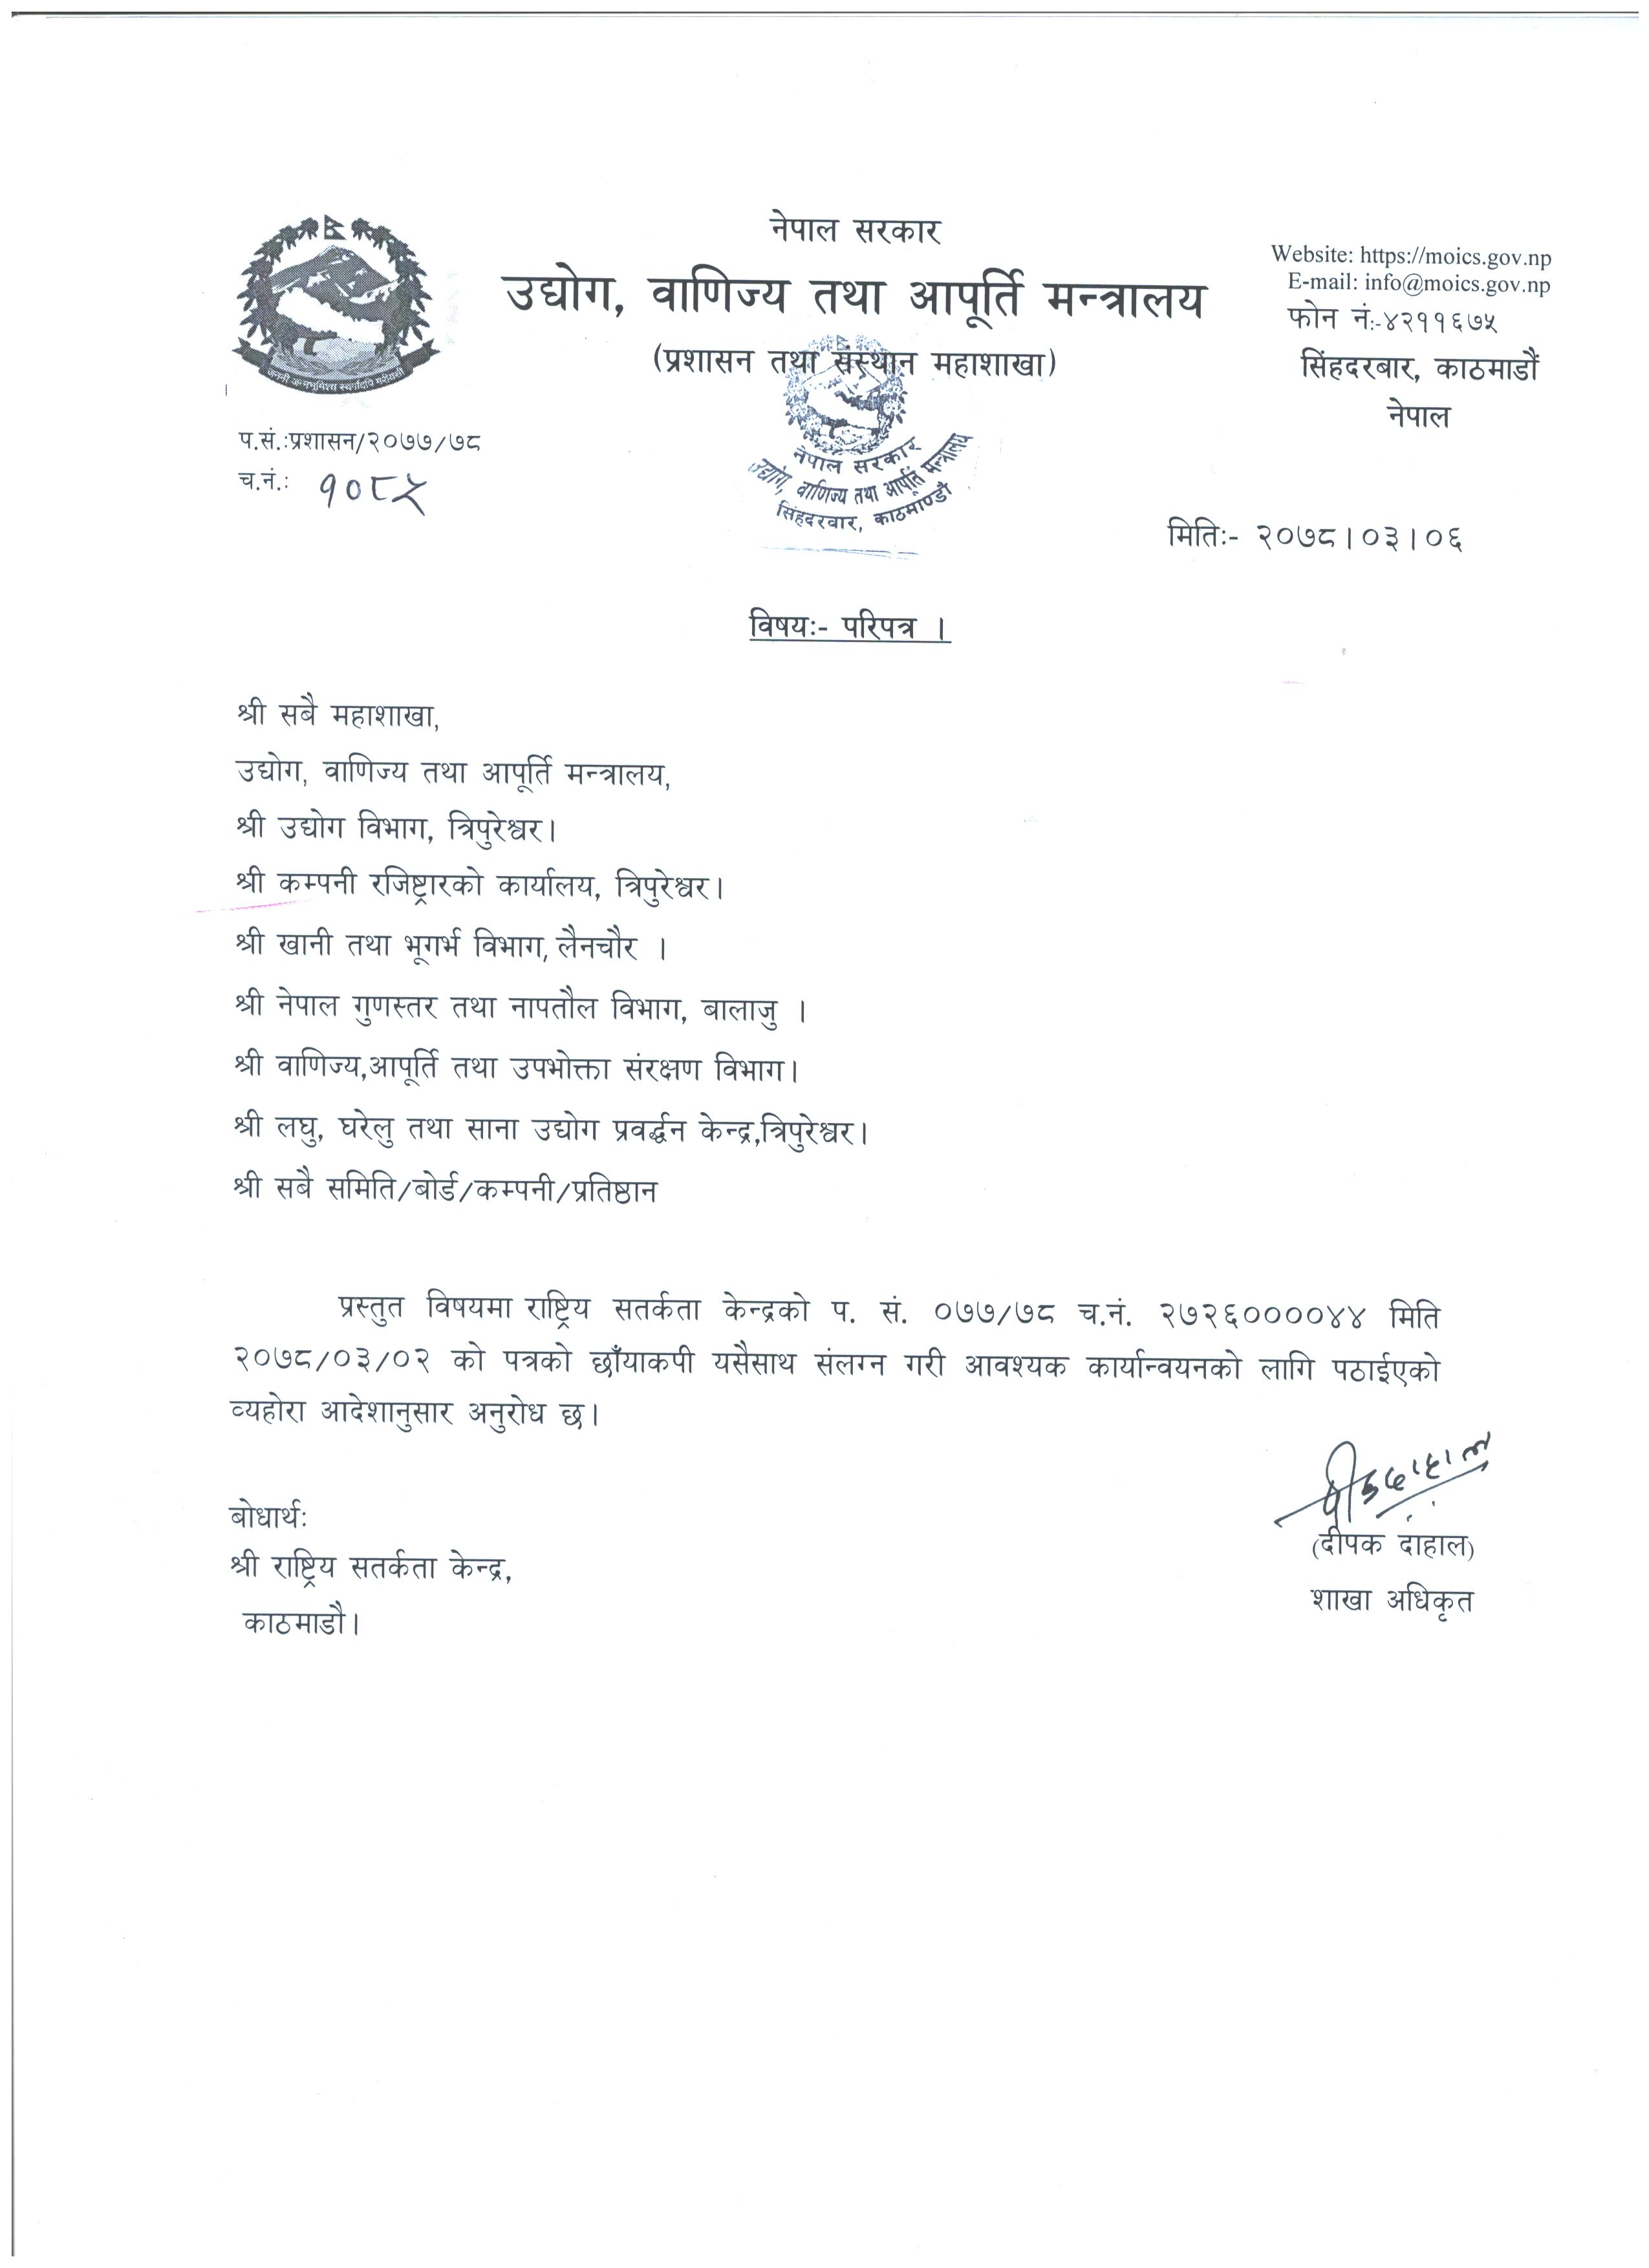 Nationality Vigilance Center Complaint Formation.